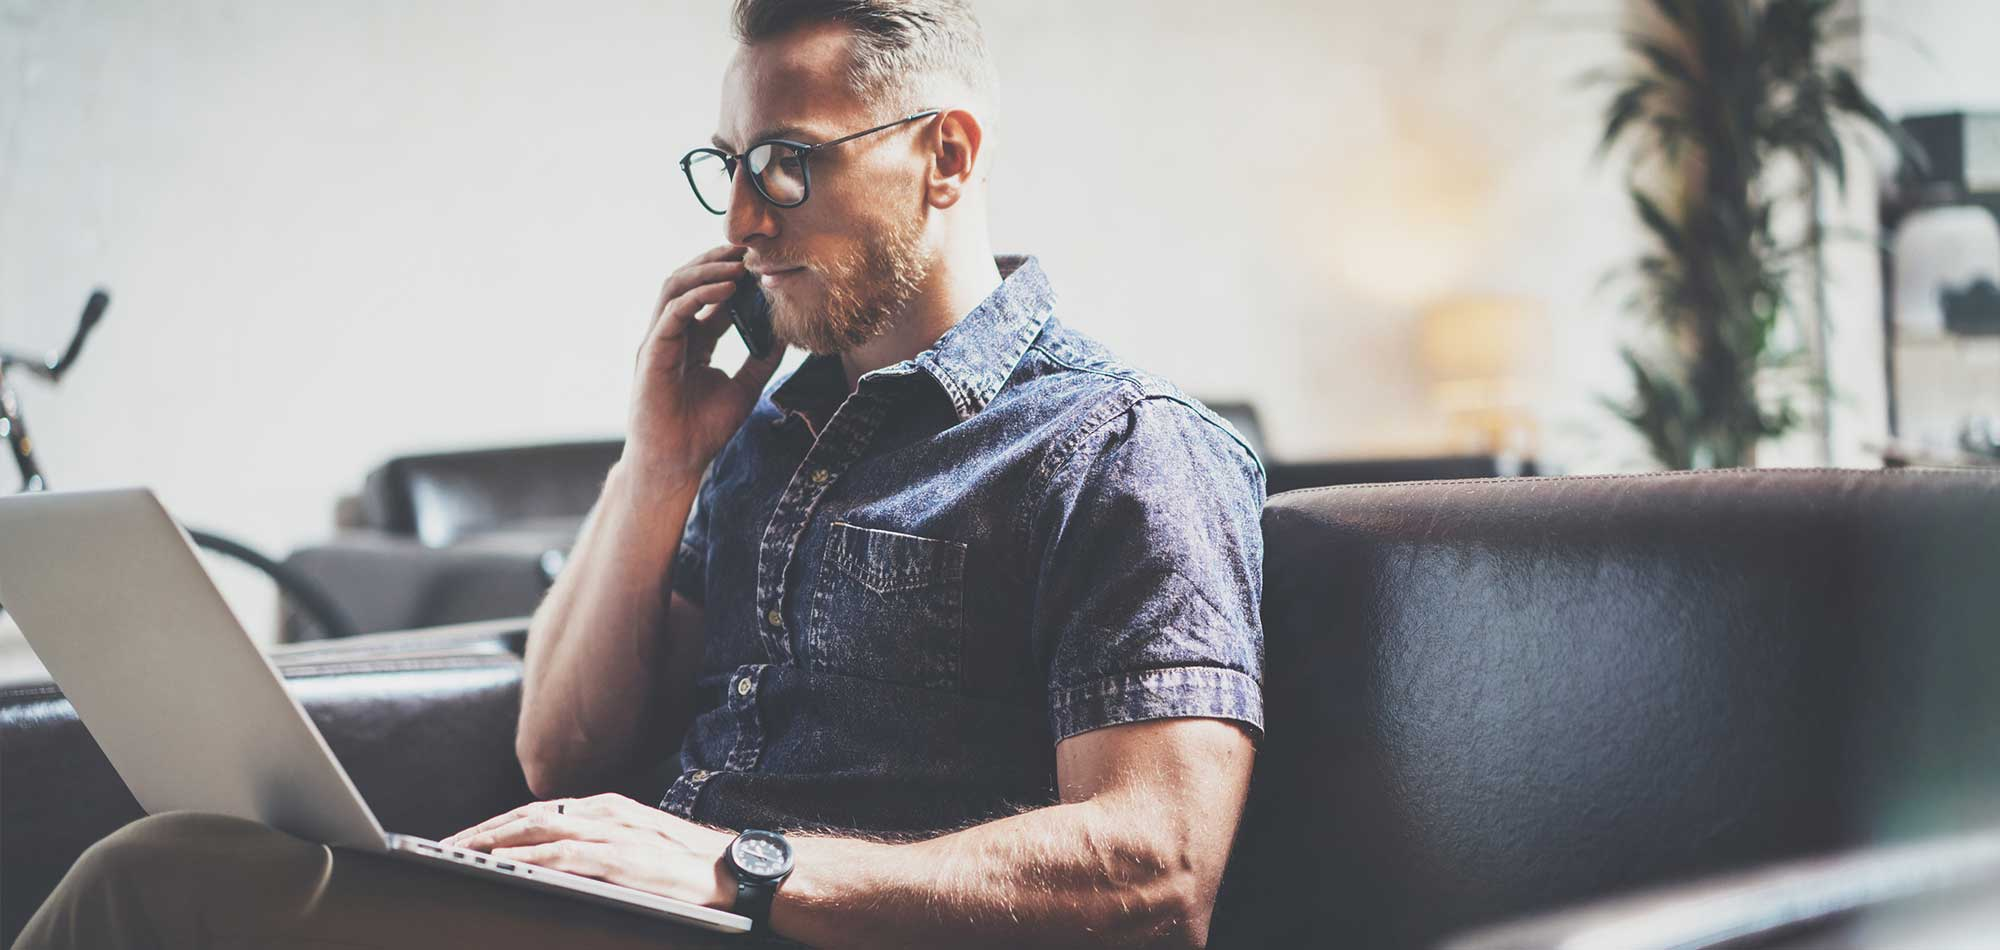 How To Design an Enterprise-Grade Wi-Fi Network